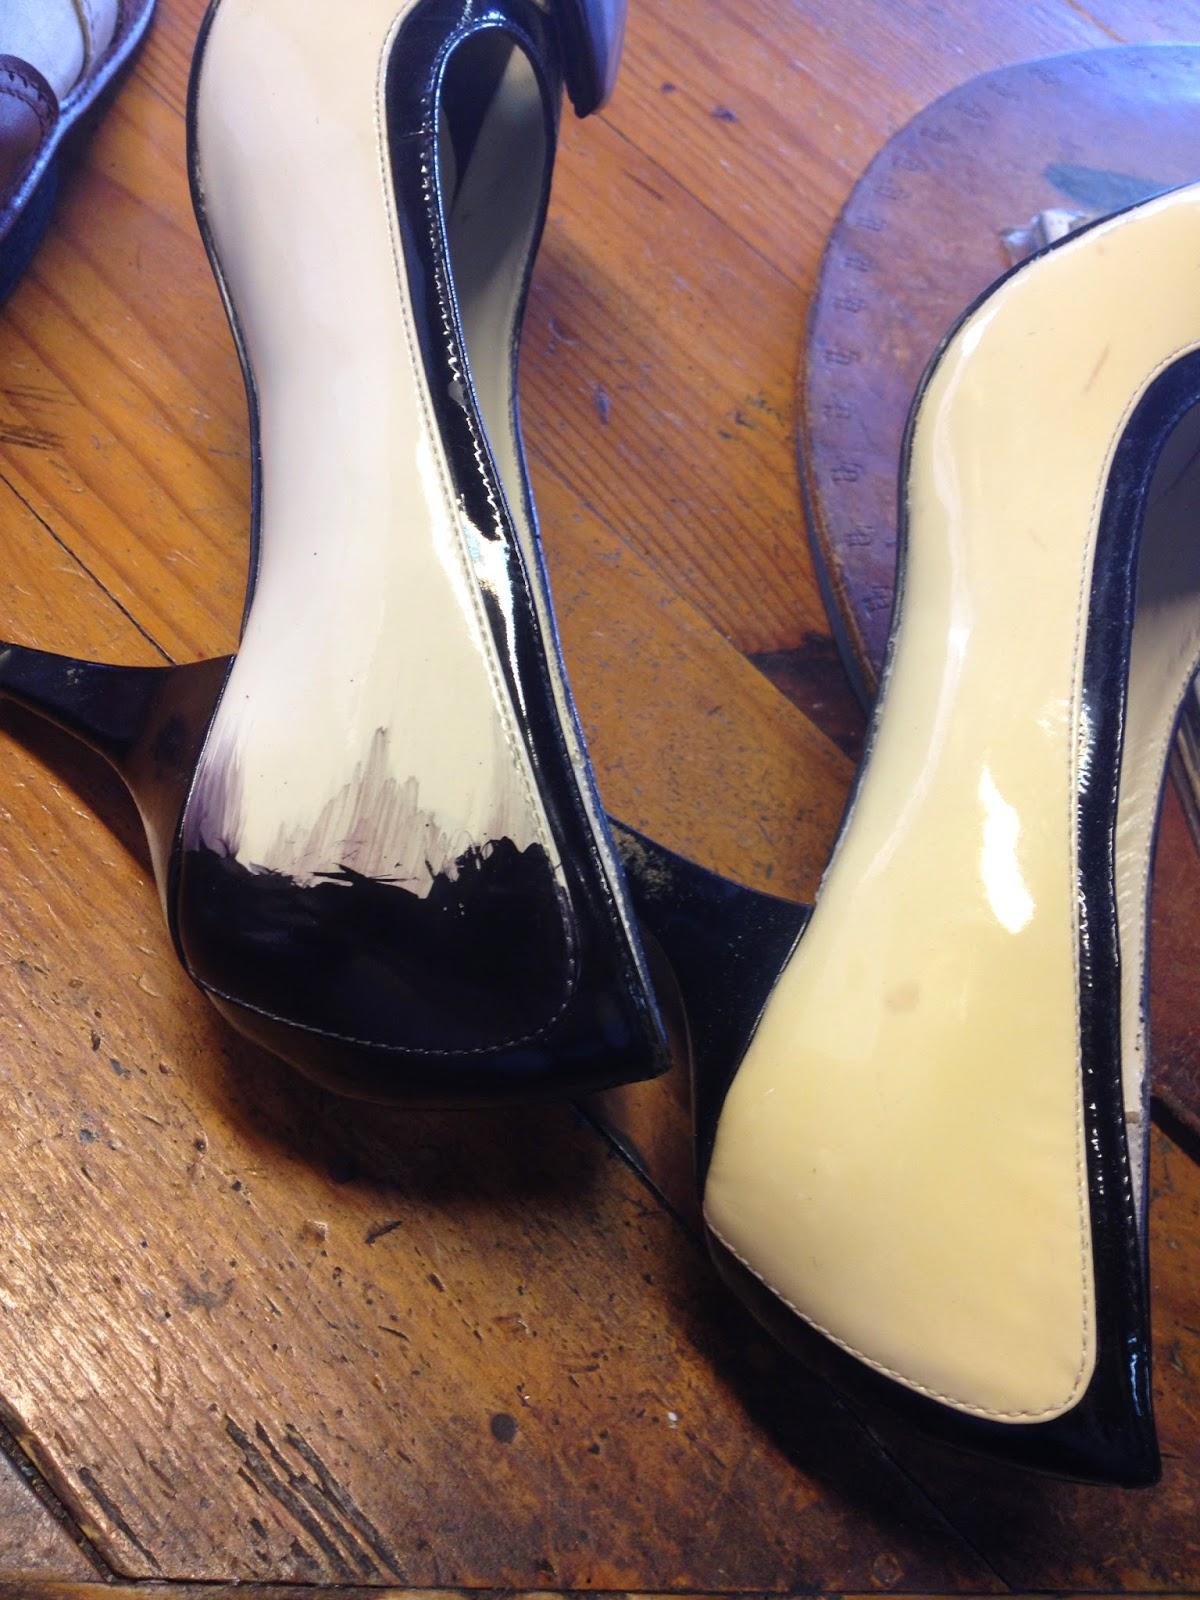 Teindre chaussure daim en noir - Teinture pour cuir ...